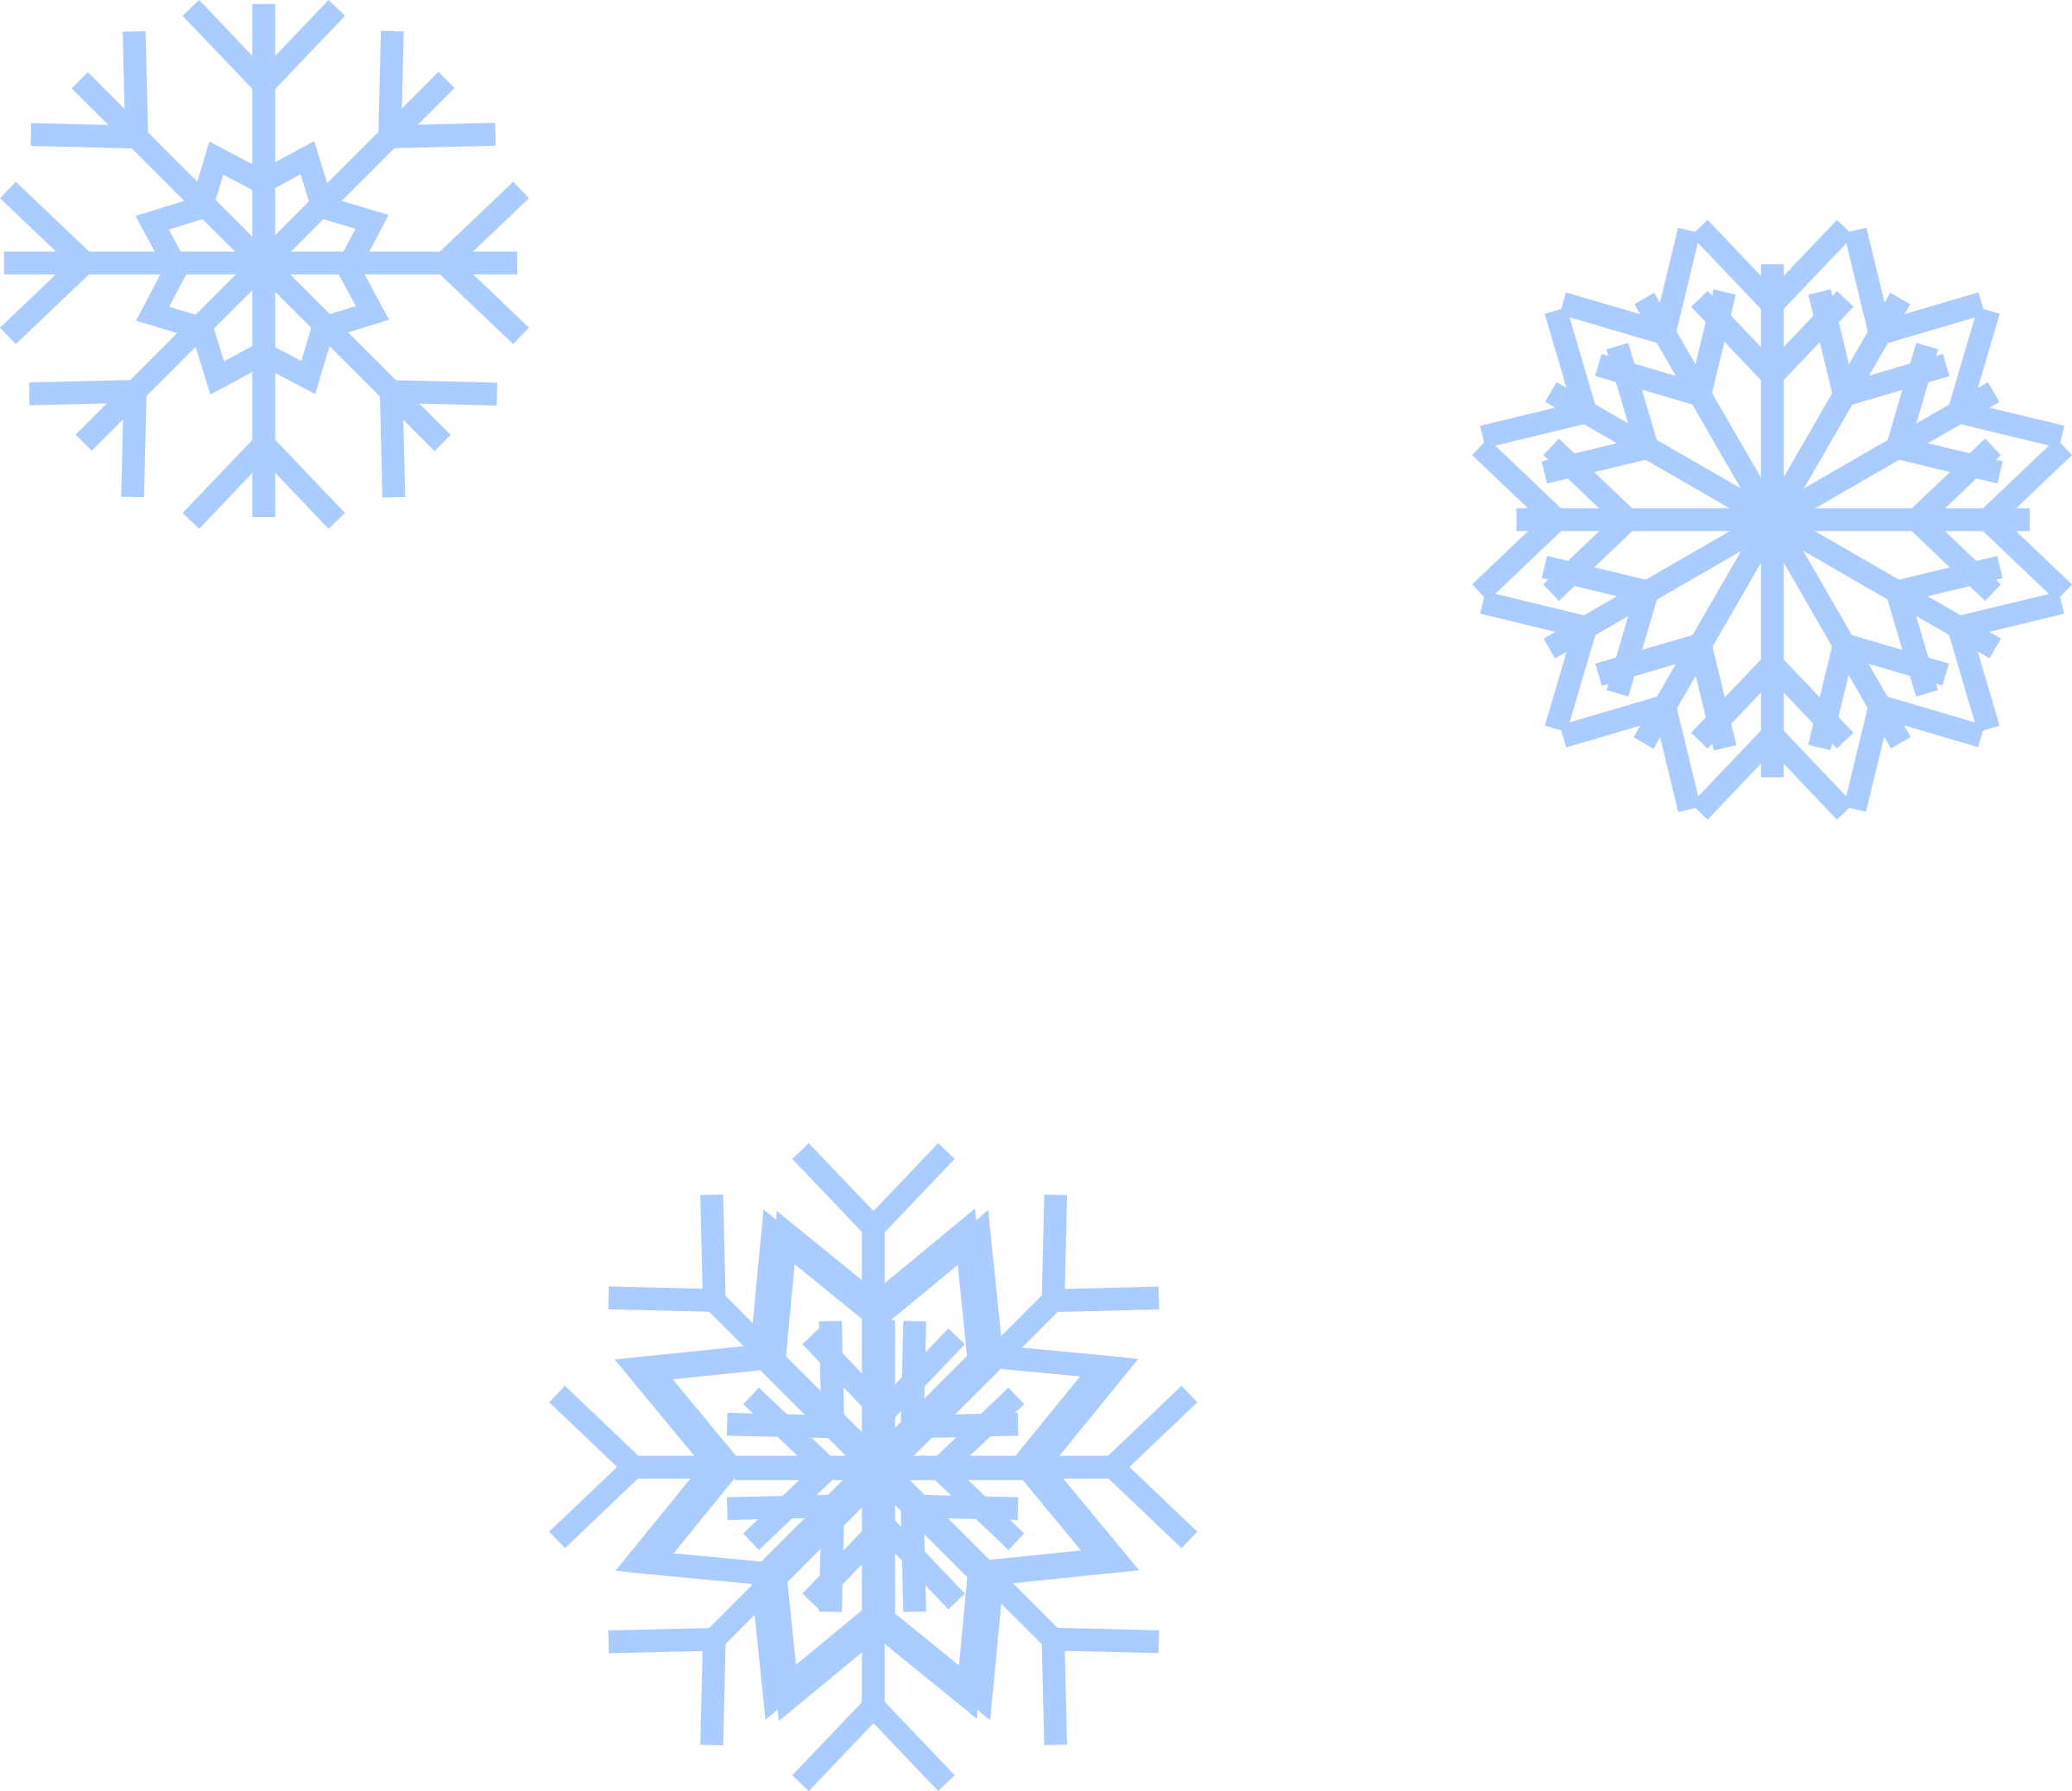 Snow flakes big image. Winter clipart flake